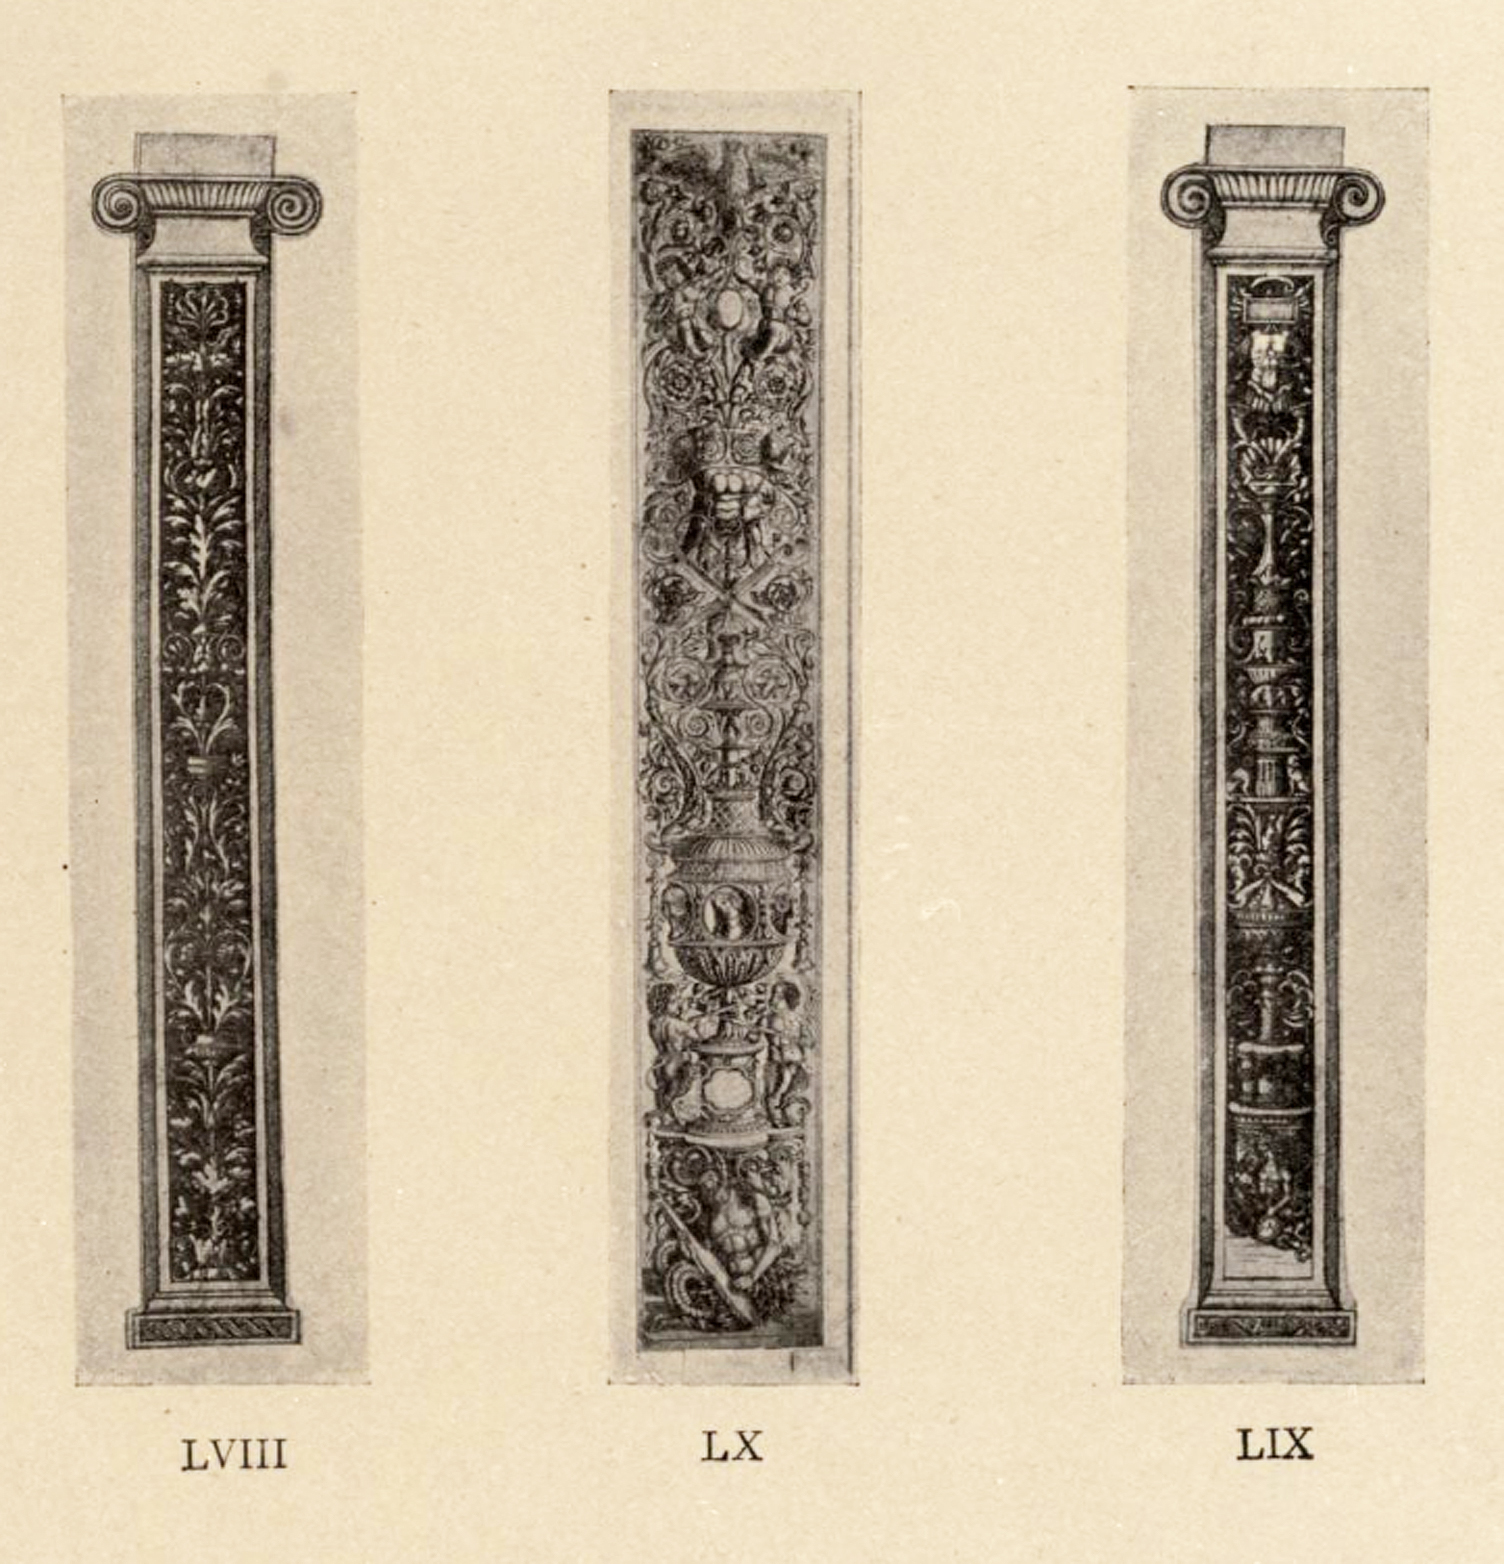 9 Zoan Andrea Panels of vertebrate & candelabrum ornament pub Arthur Hind